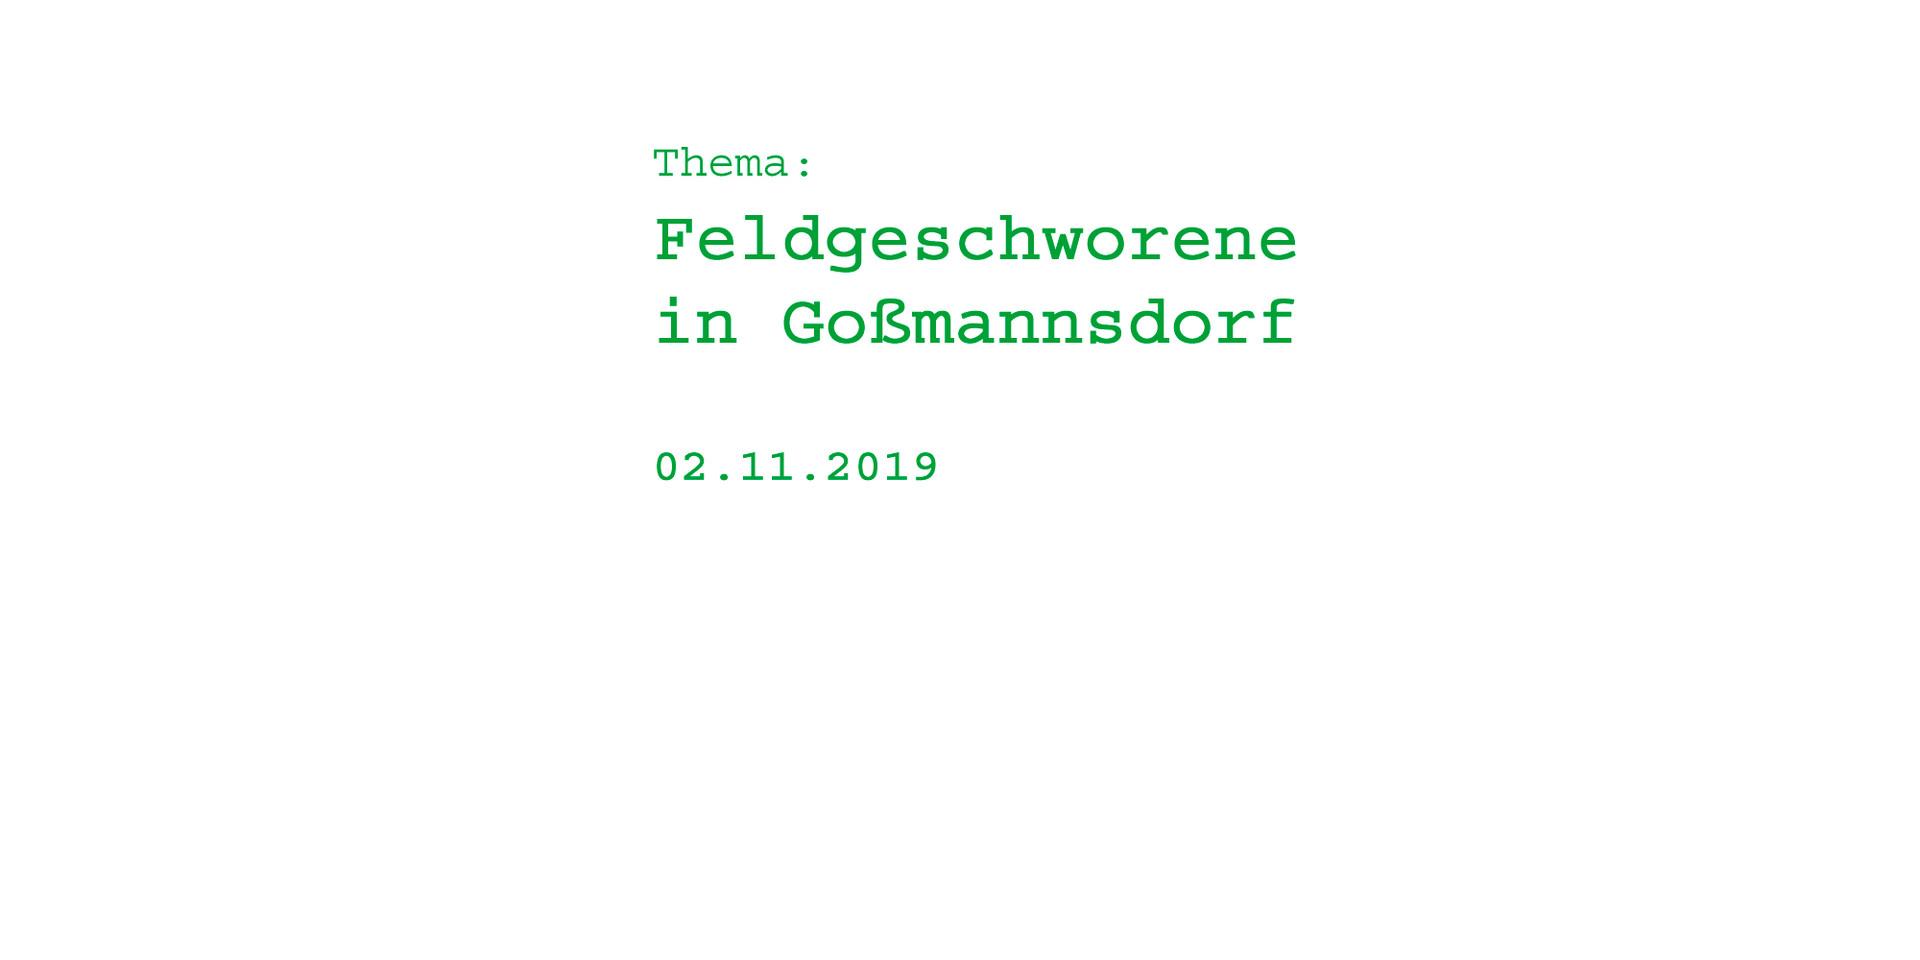 Feldgeschworene in Goßmannsdorf